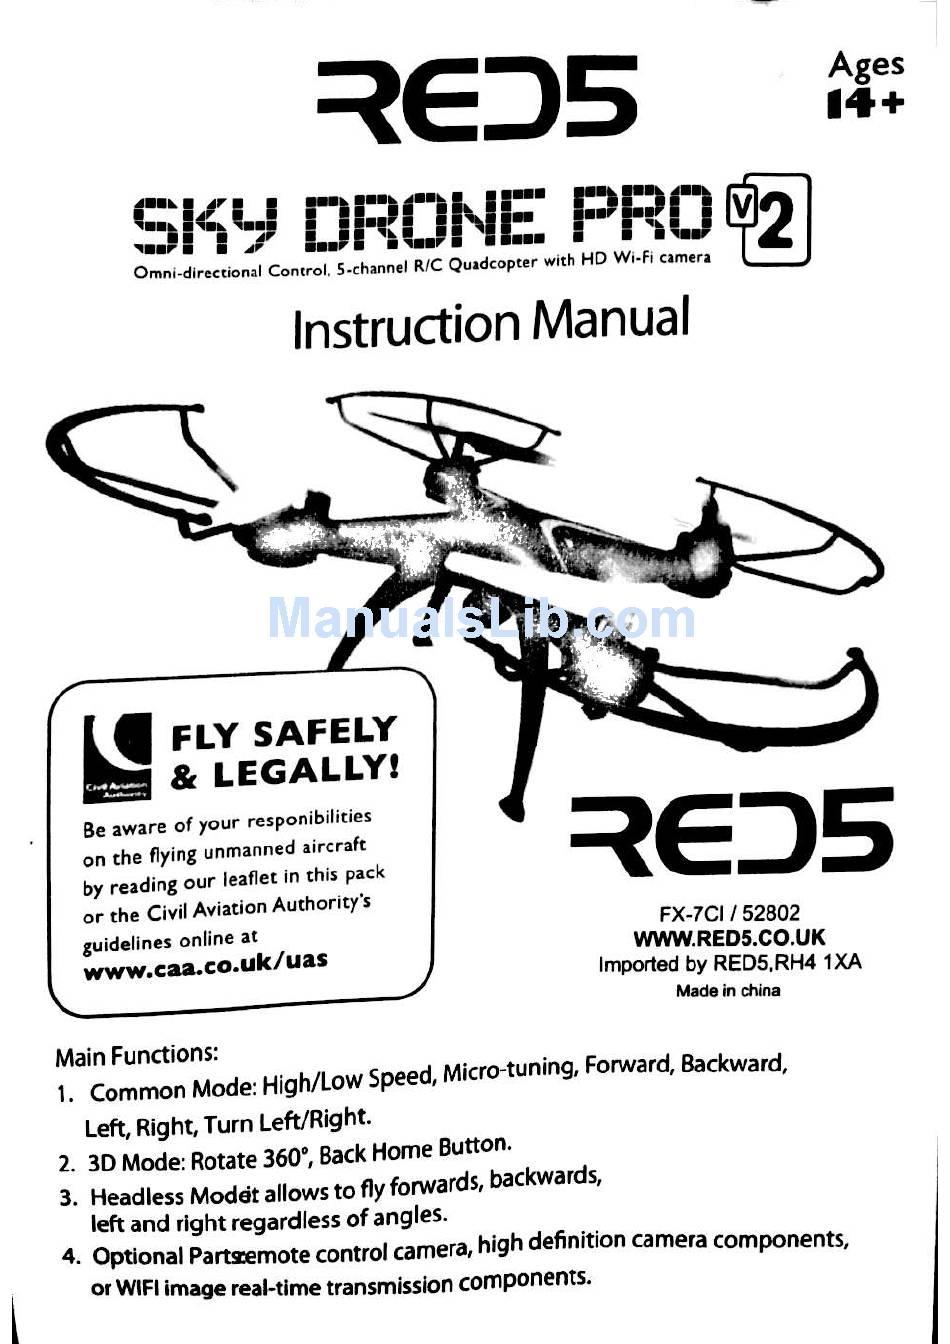 RED5 SKY DRONE PRO V2 INSTRUCTION MANUAL Pdf Download